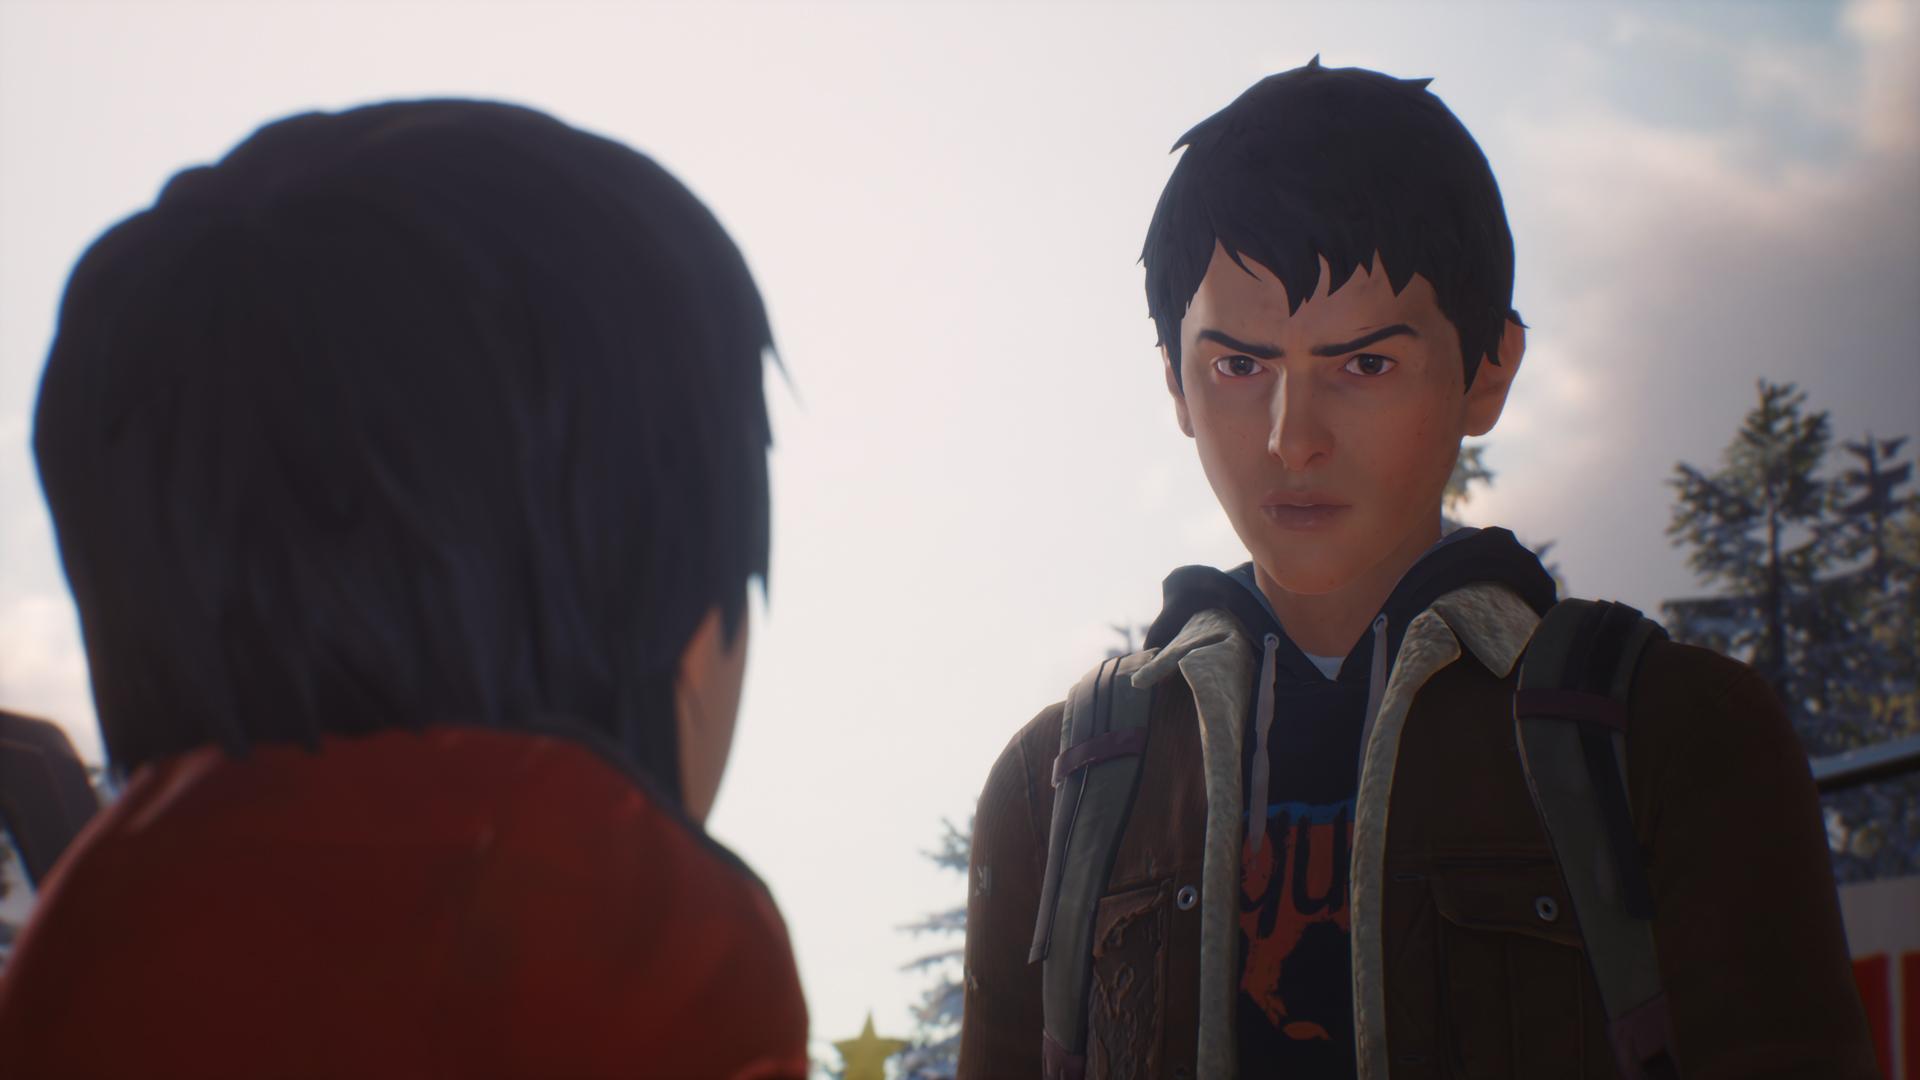 life-is-strange-2-episode-2-launch-trailer-revealed-frikigamers.com